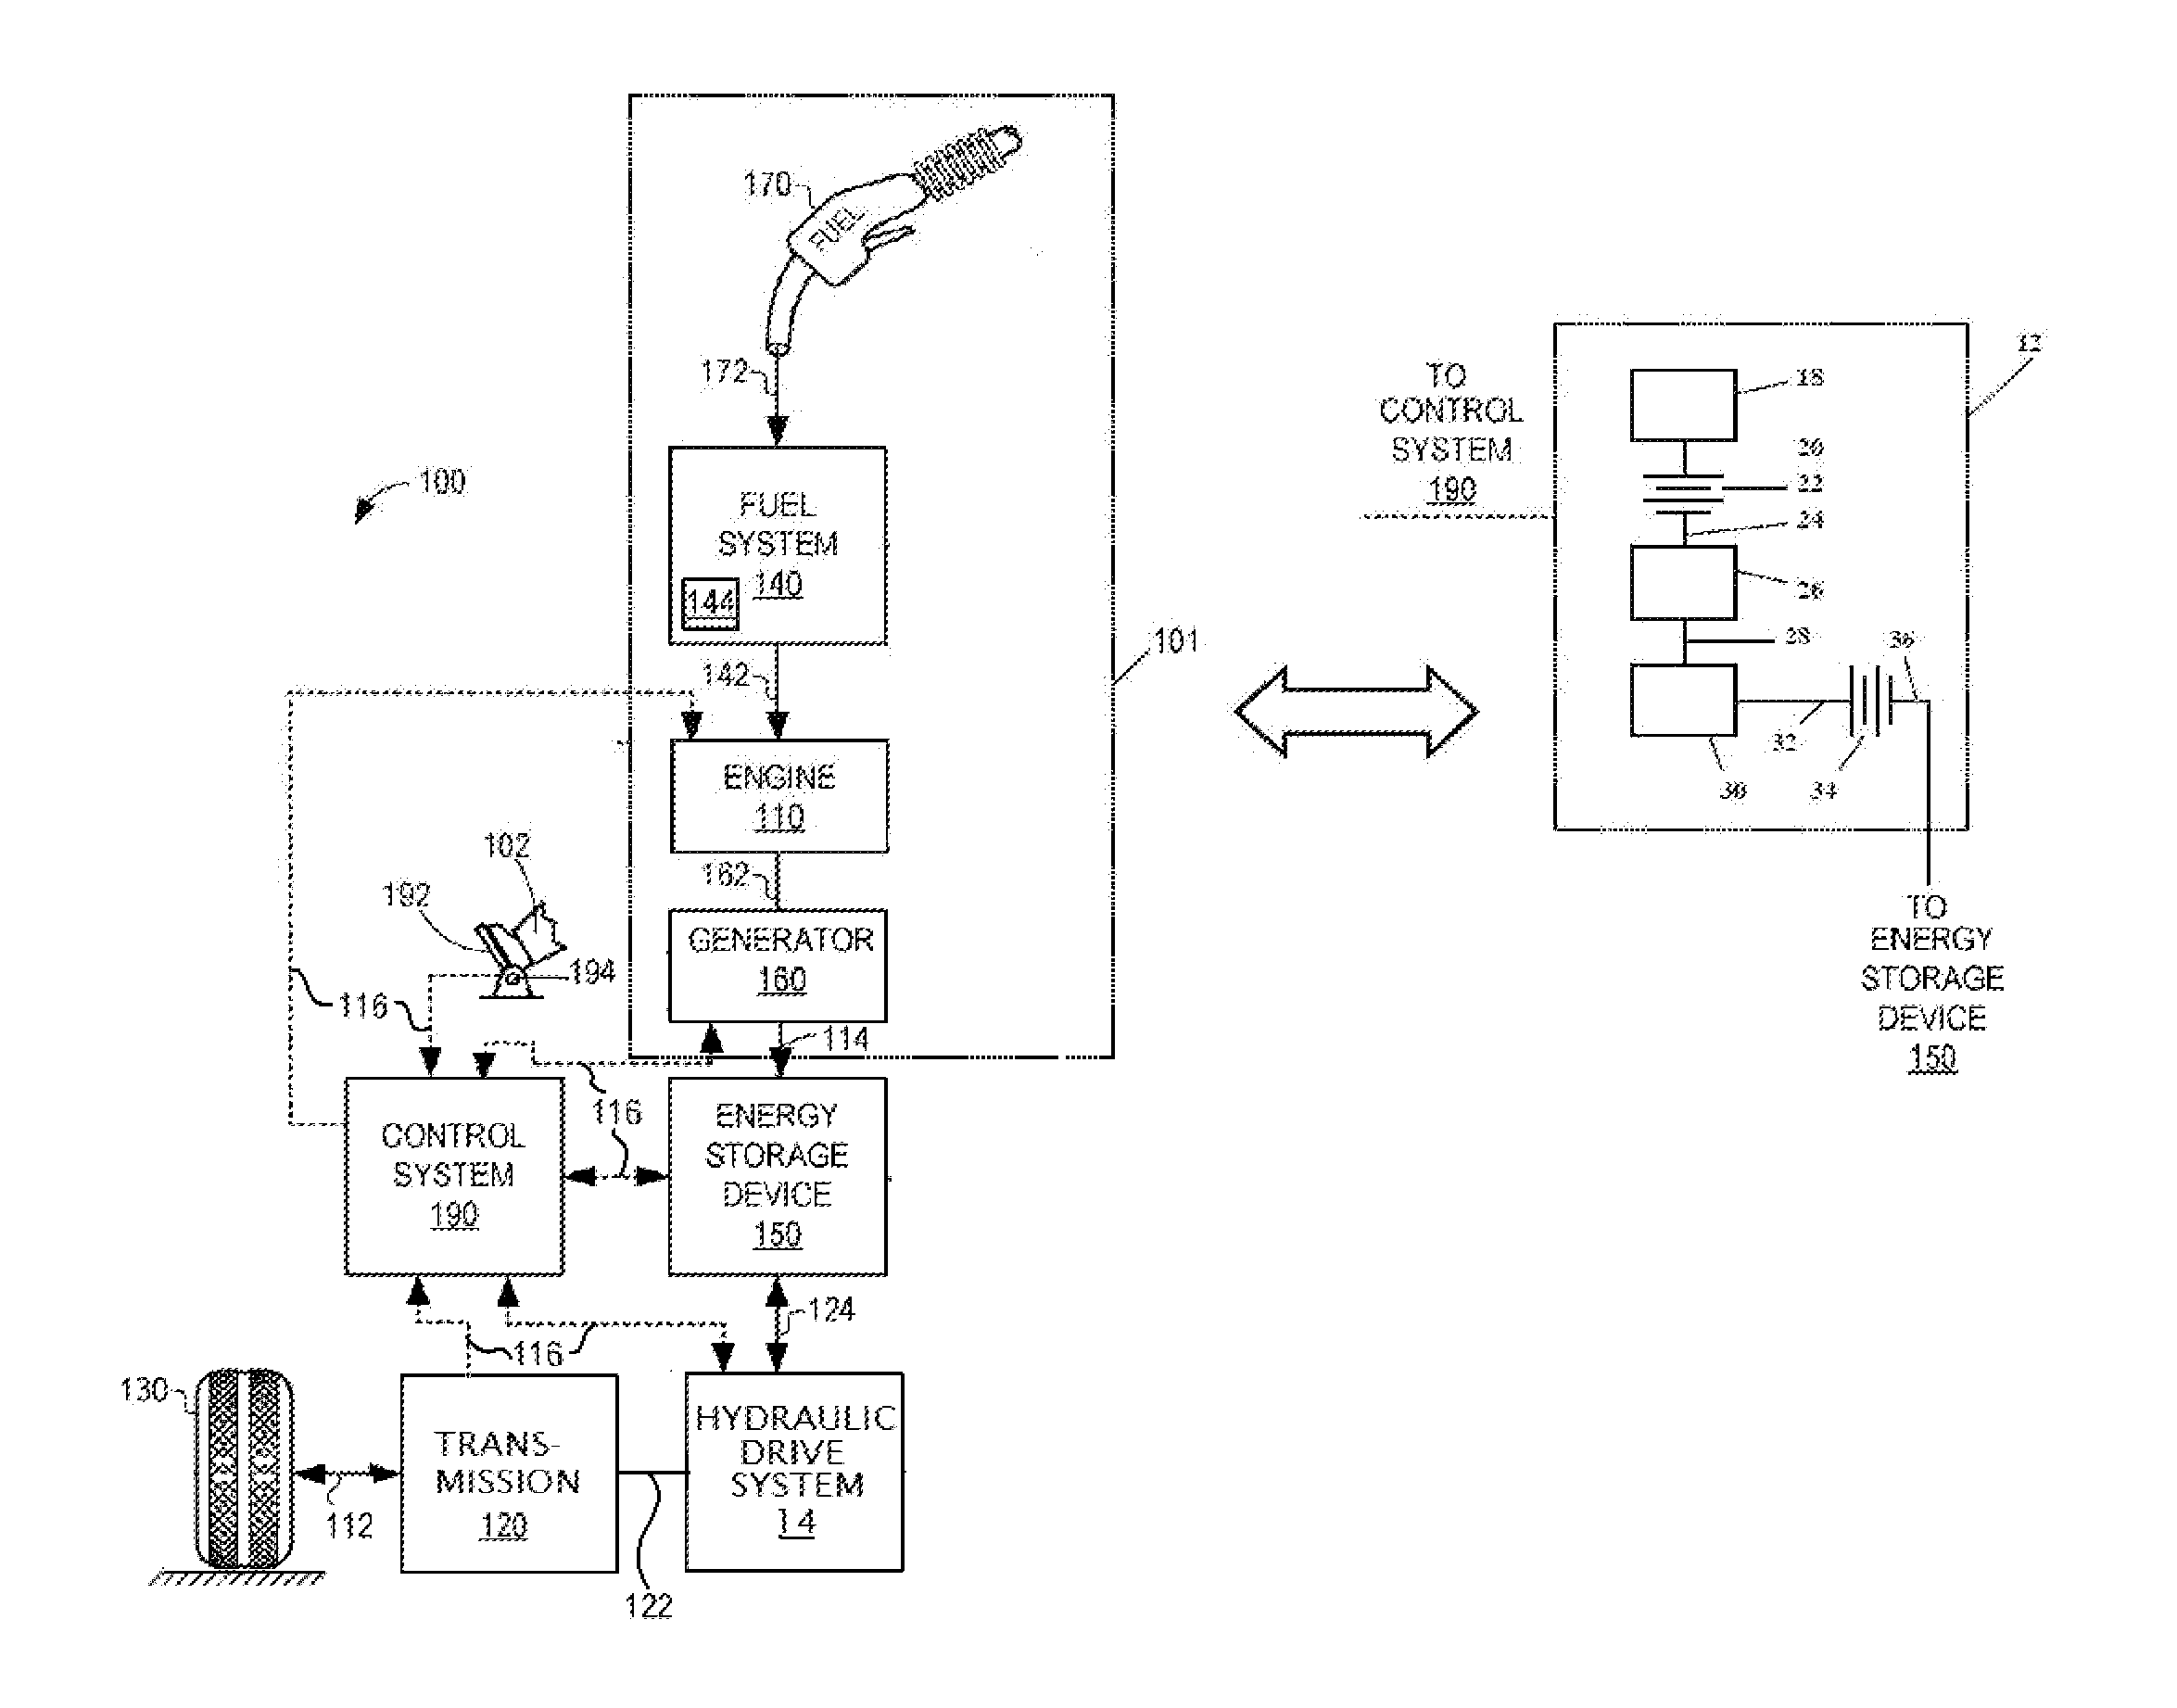 Diagram Worcester 24i System Boiler Wiring Diagram Full Version Hd Quality Wiring Diagram Winiphonexs Praga Haiti Fr